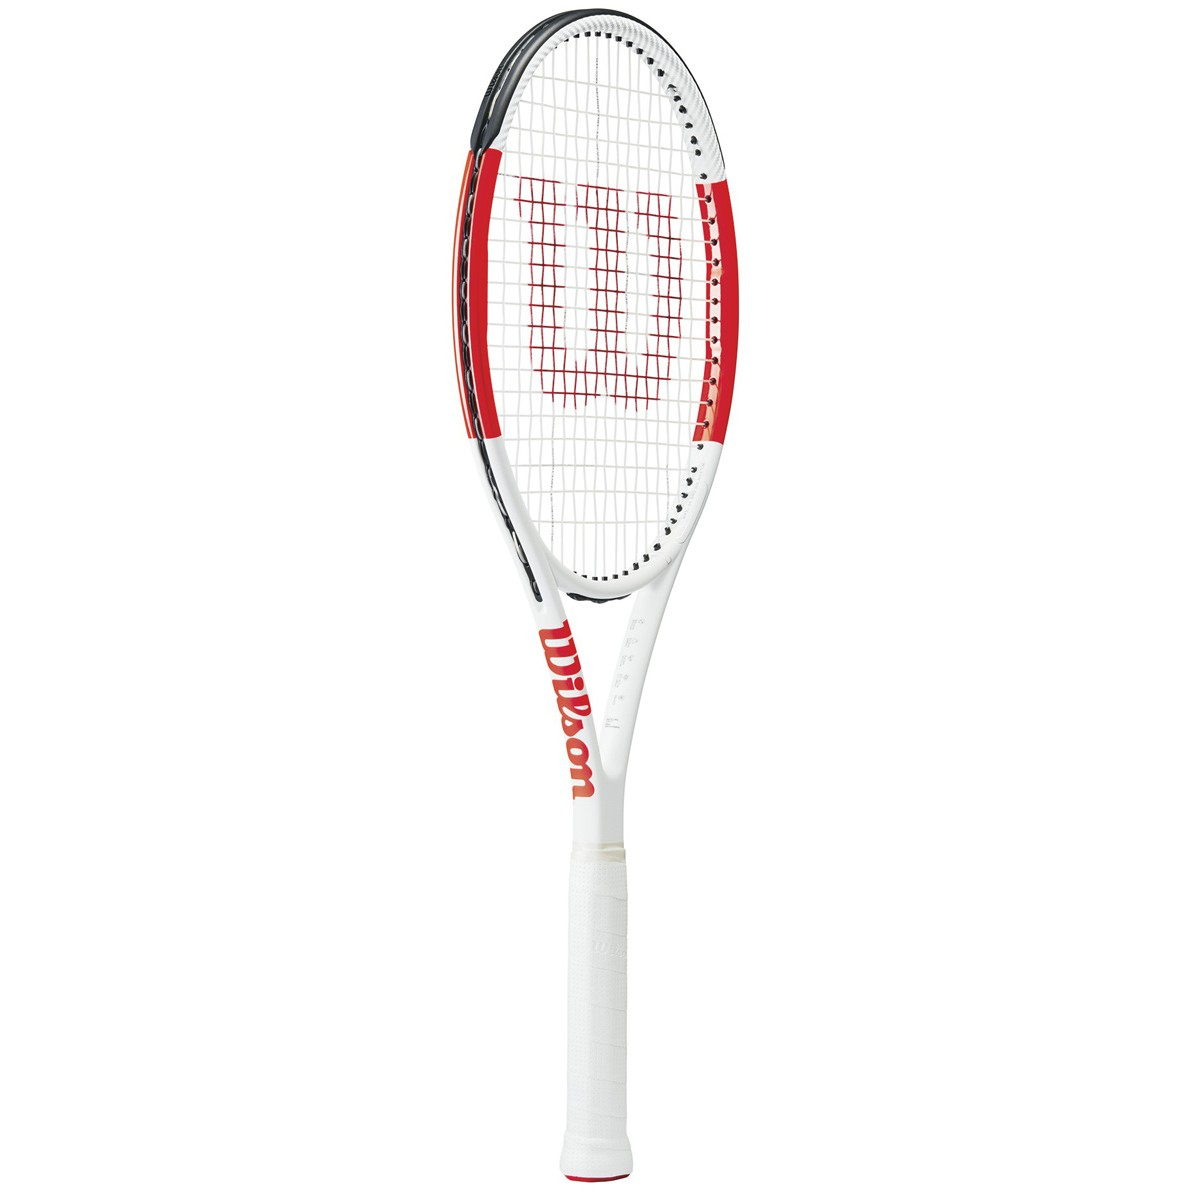 One Team 95 Raquette de Tennis Wilson Six